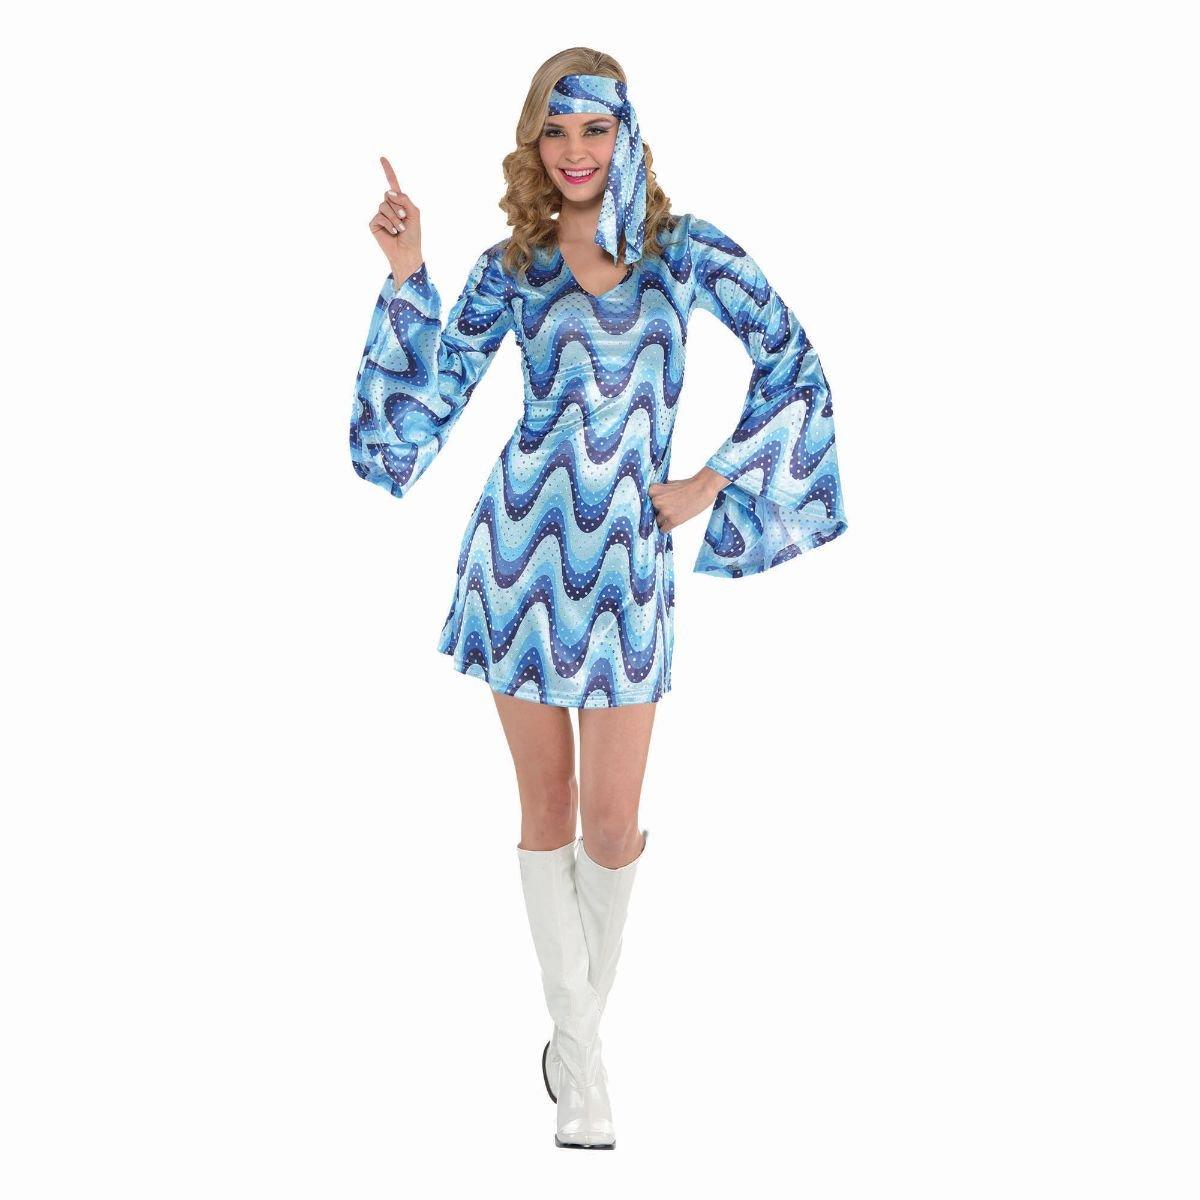 1970s Disco Outfit: Amazon.co.uk